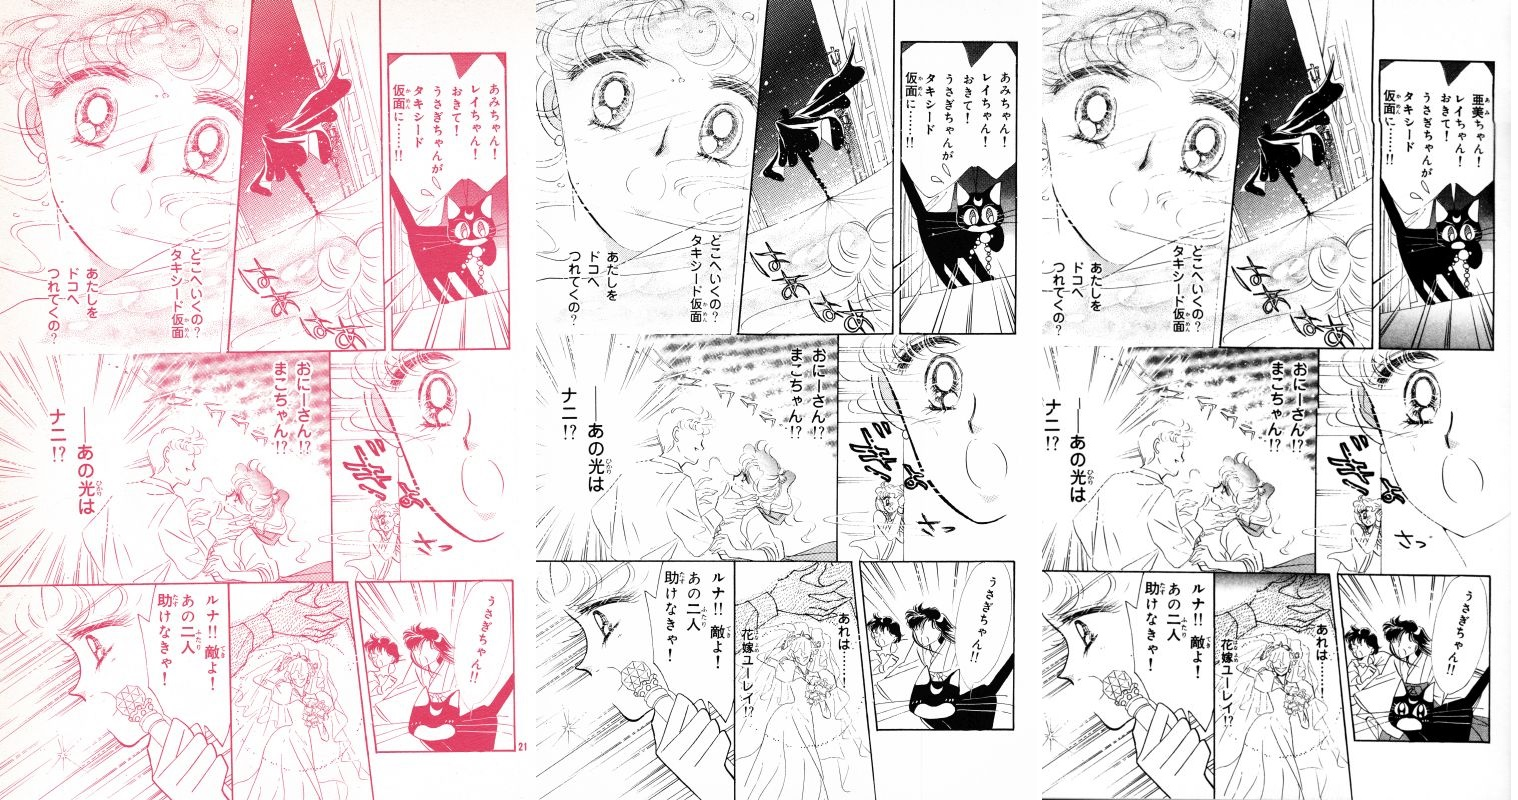 Act 5, Page 19 – Nakayoshi, Original, Remaster